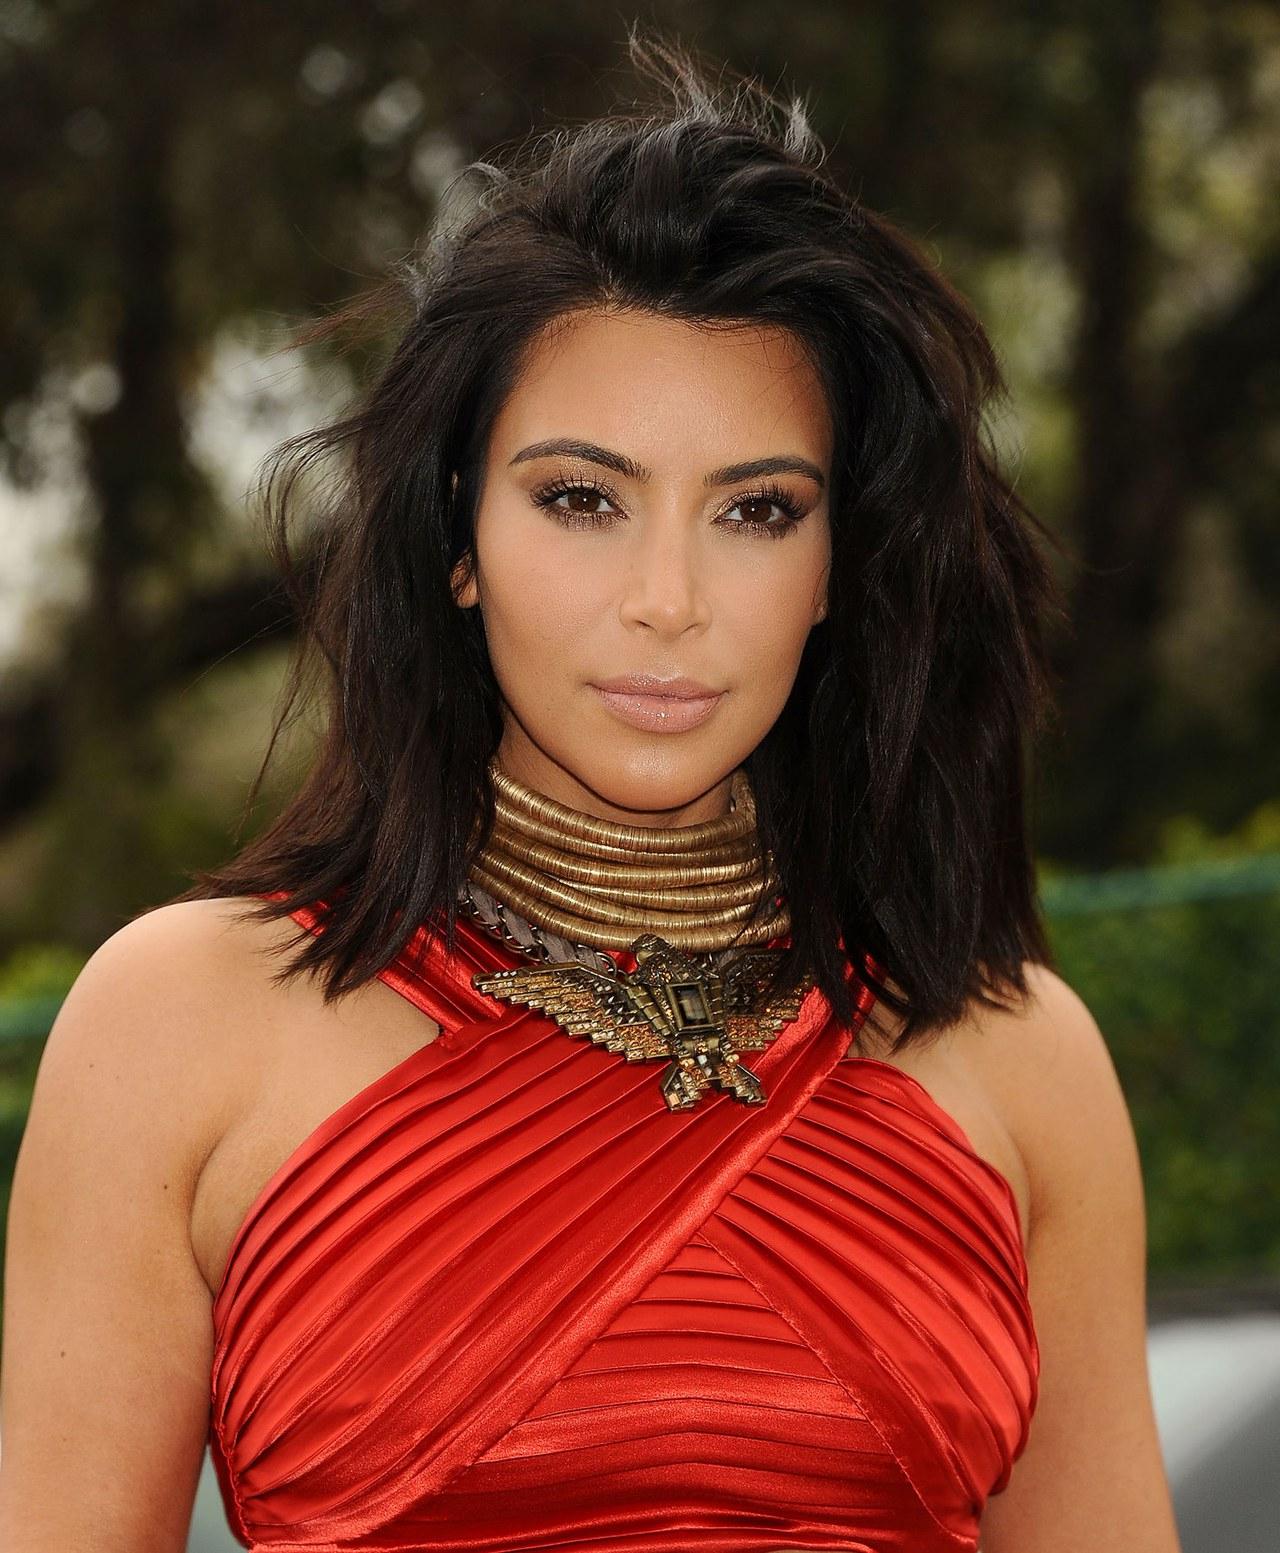 Kim Kardashian Washes Her Hair Every 5 Days (View 10 of 25)